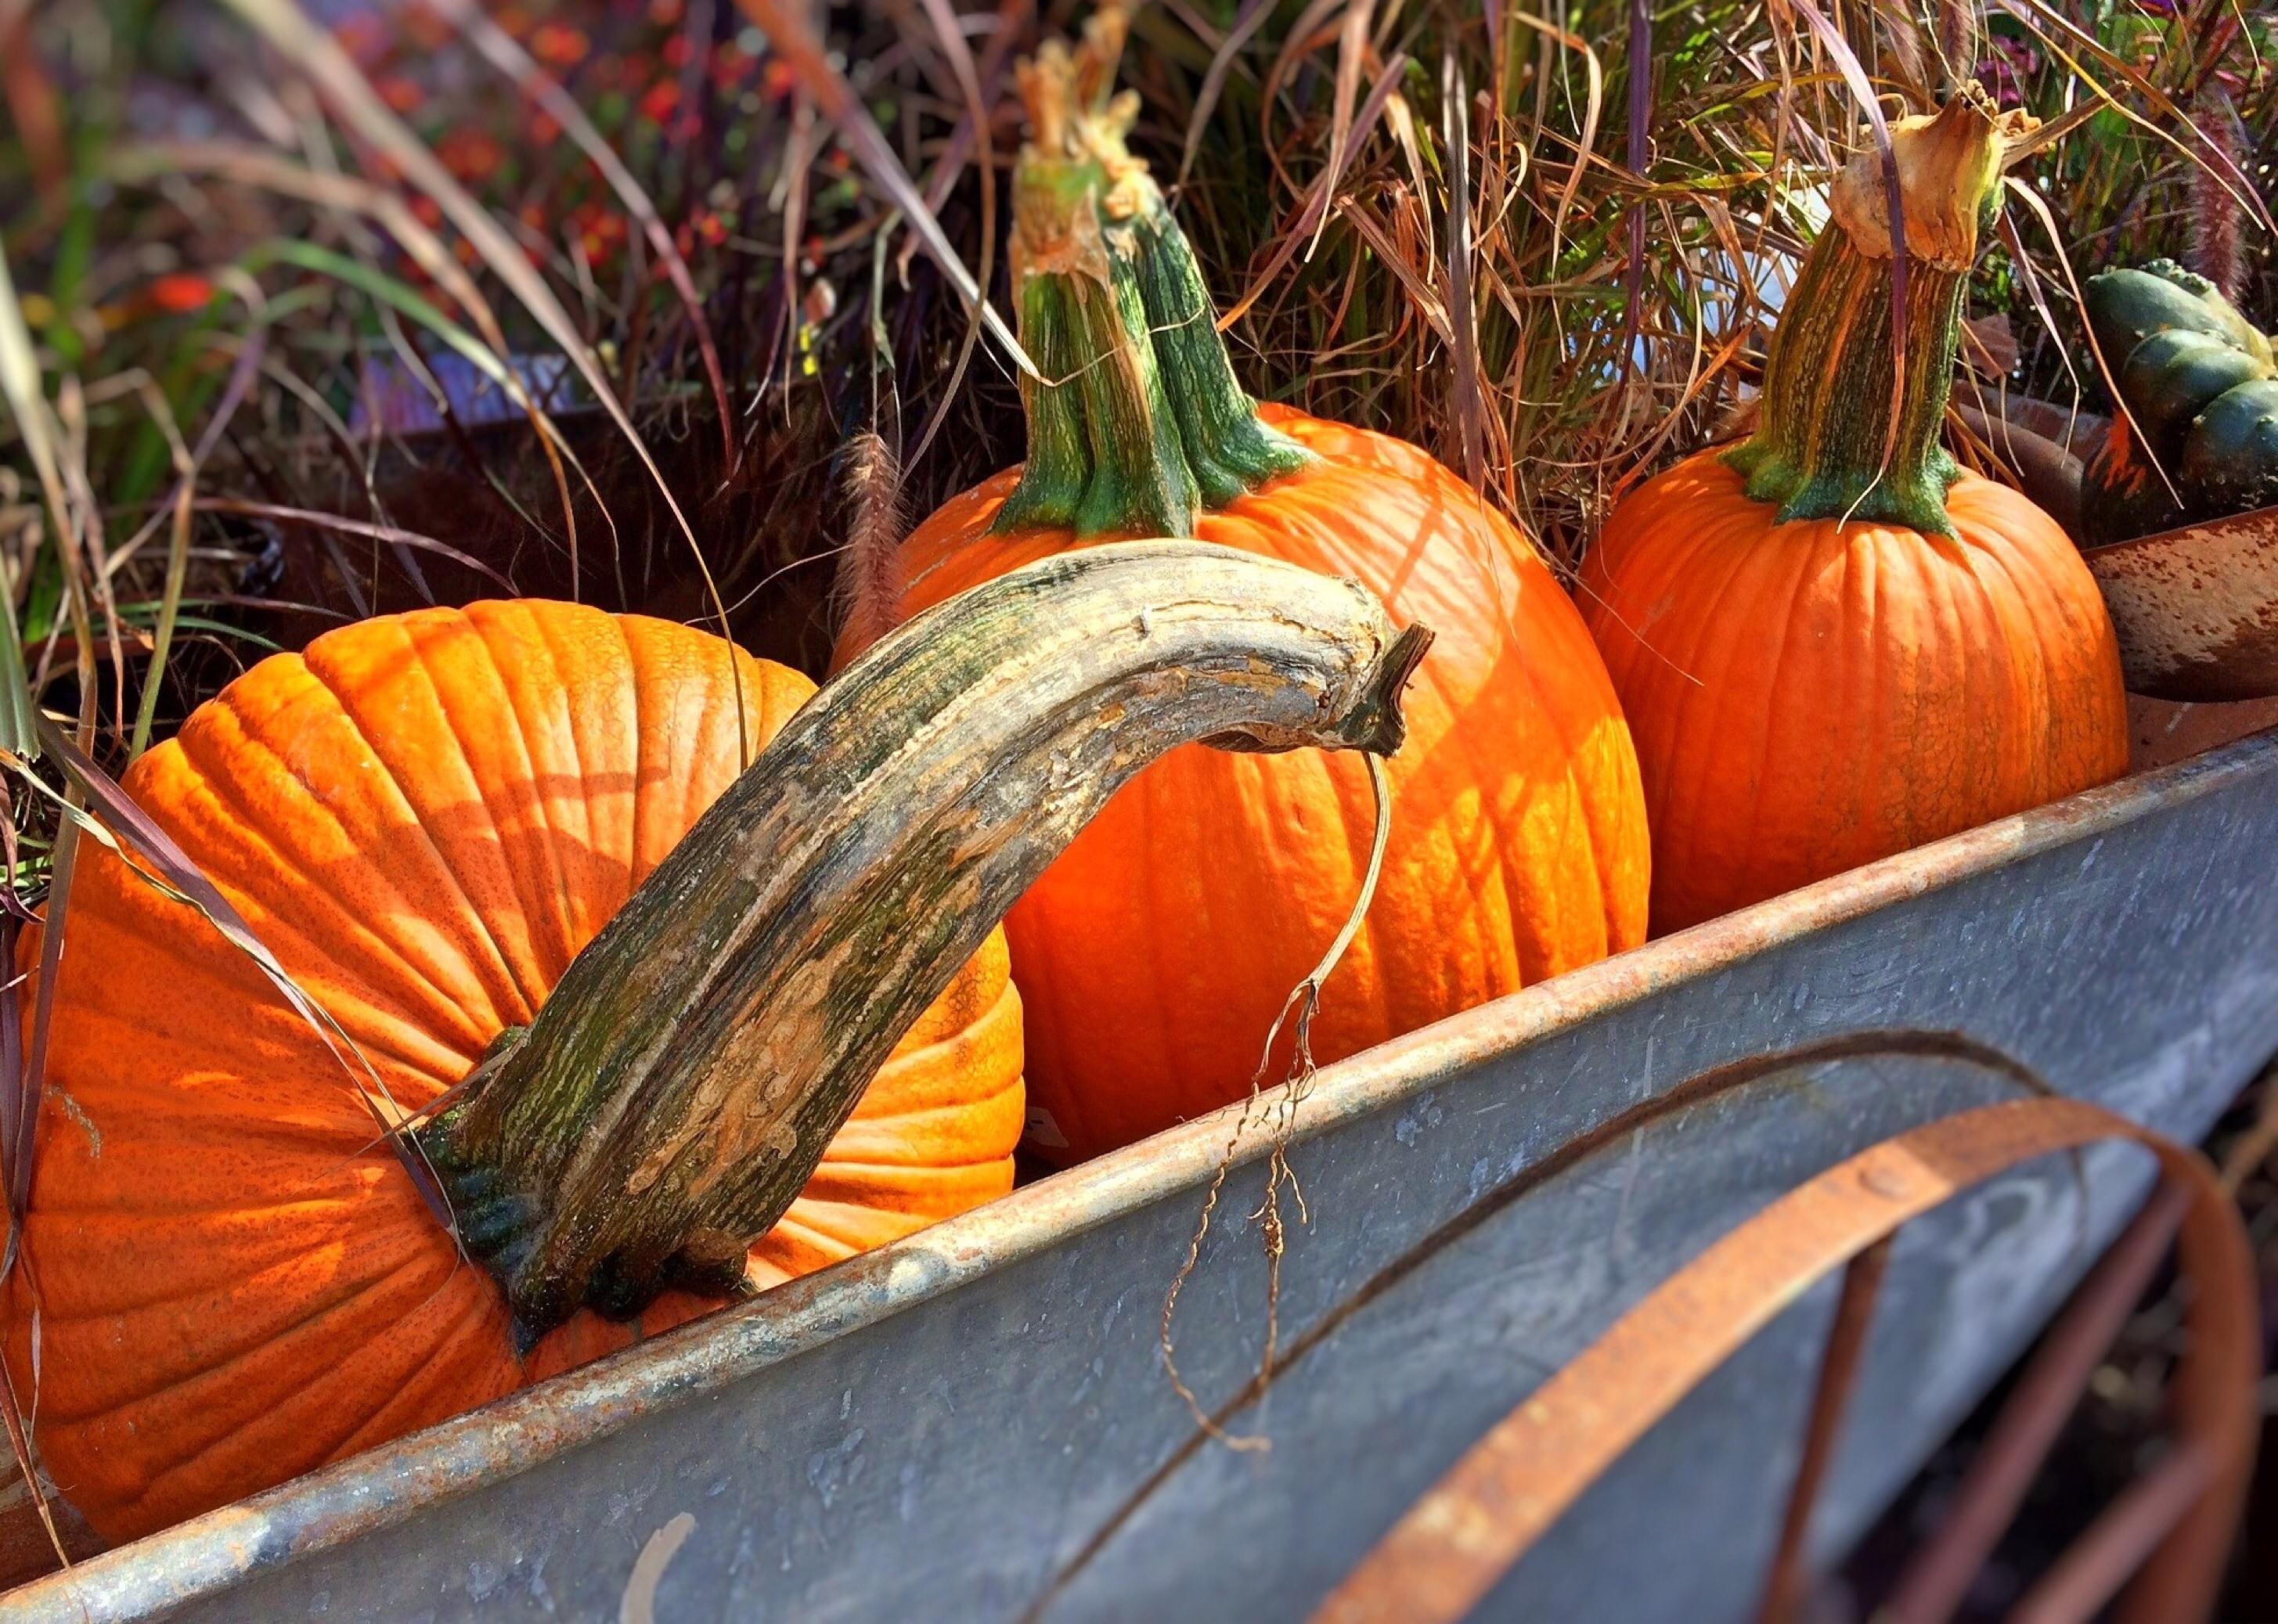 Fall, Halloween, Pumpkins, Autumn, pumpkin, orange color